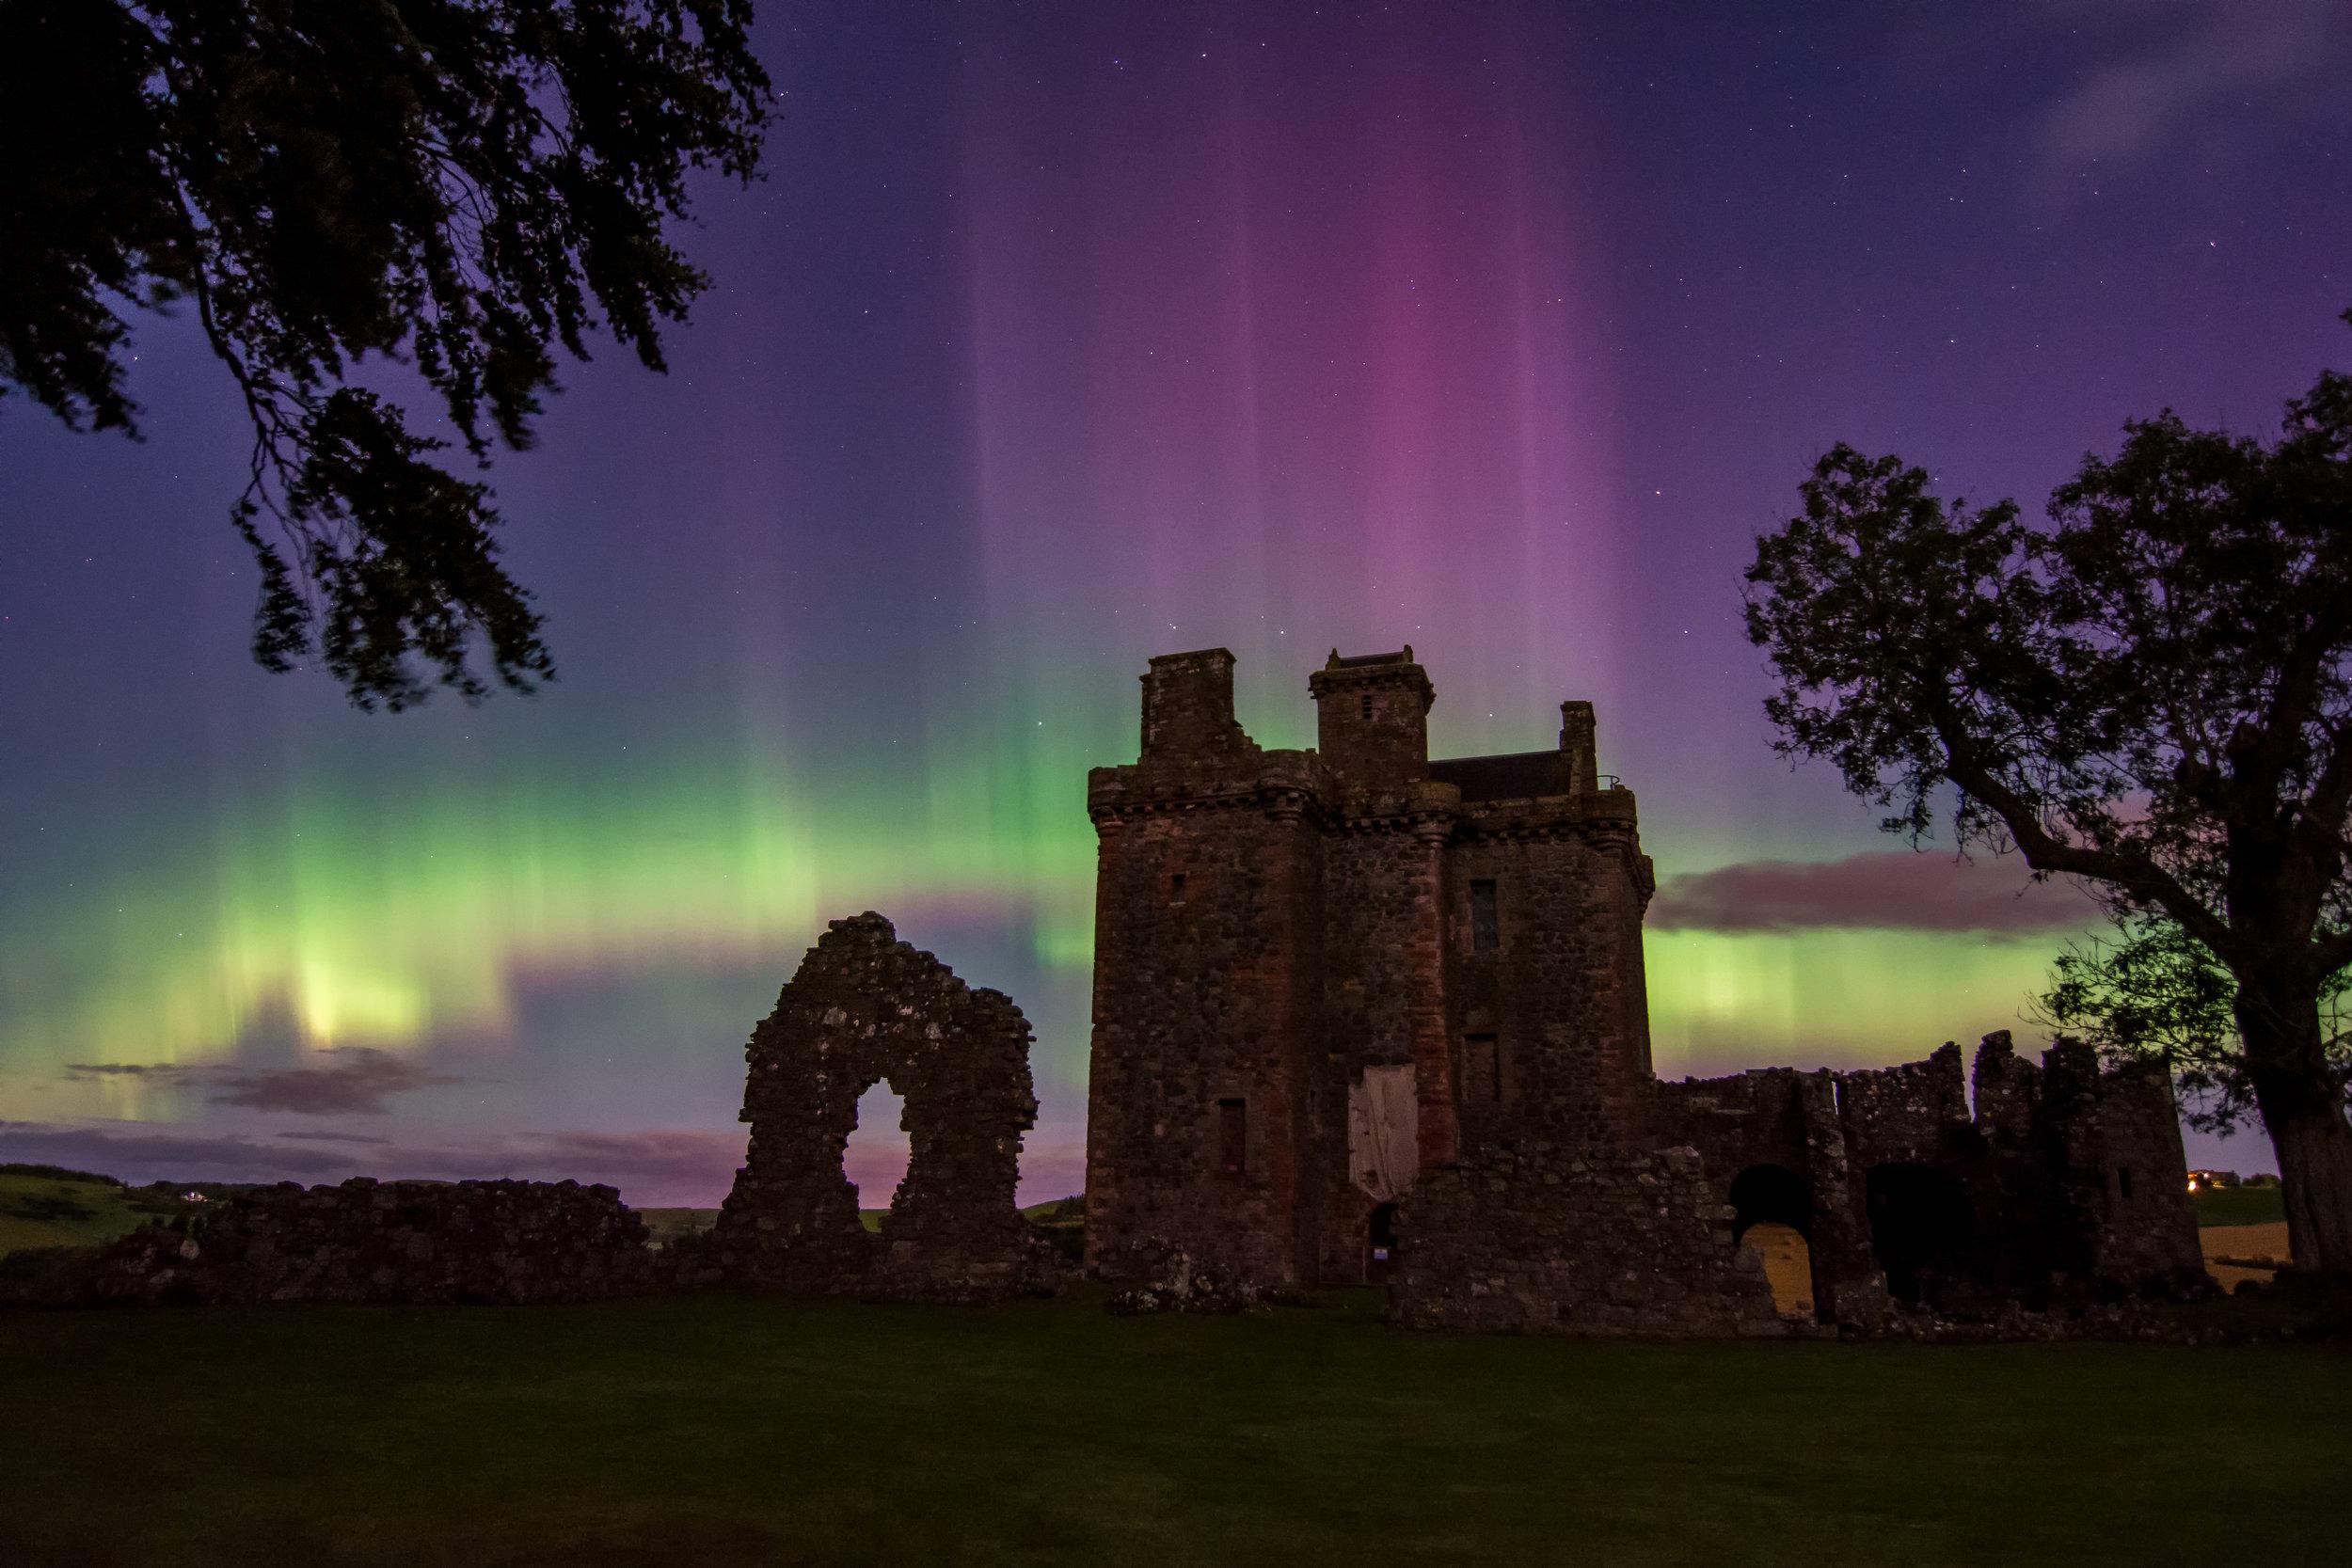 Aurora at Balvaird Castle by Katherine Fotheringham